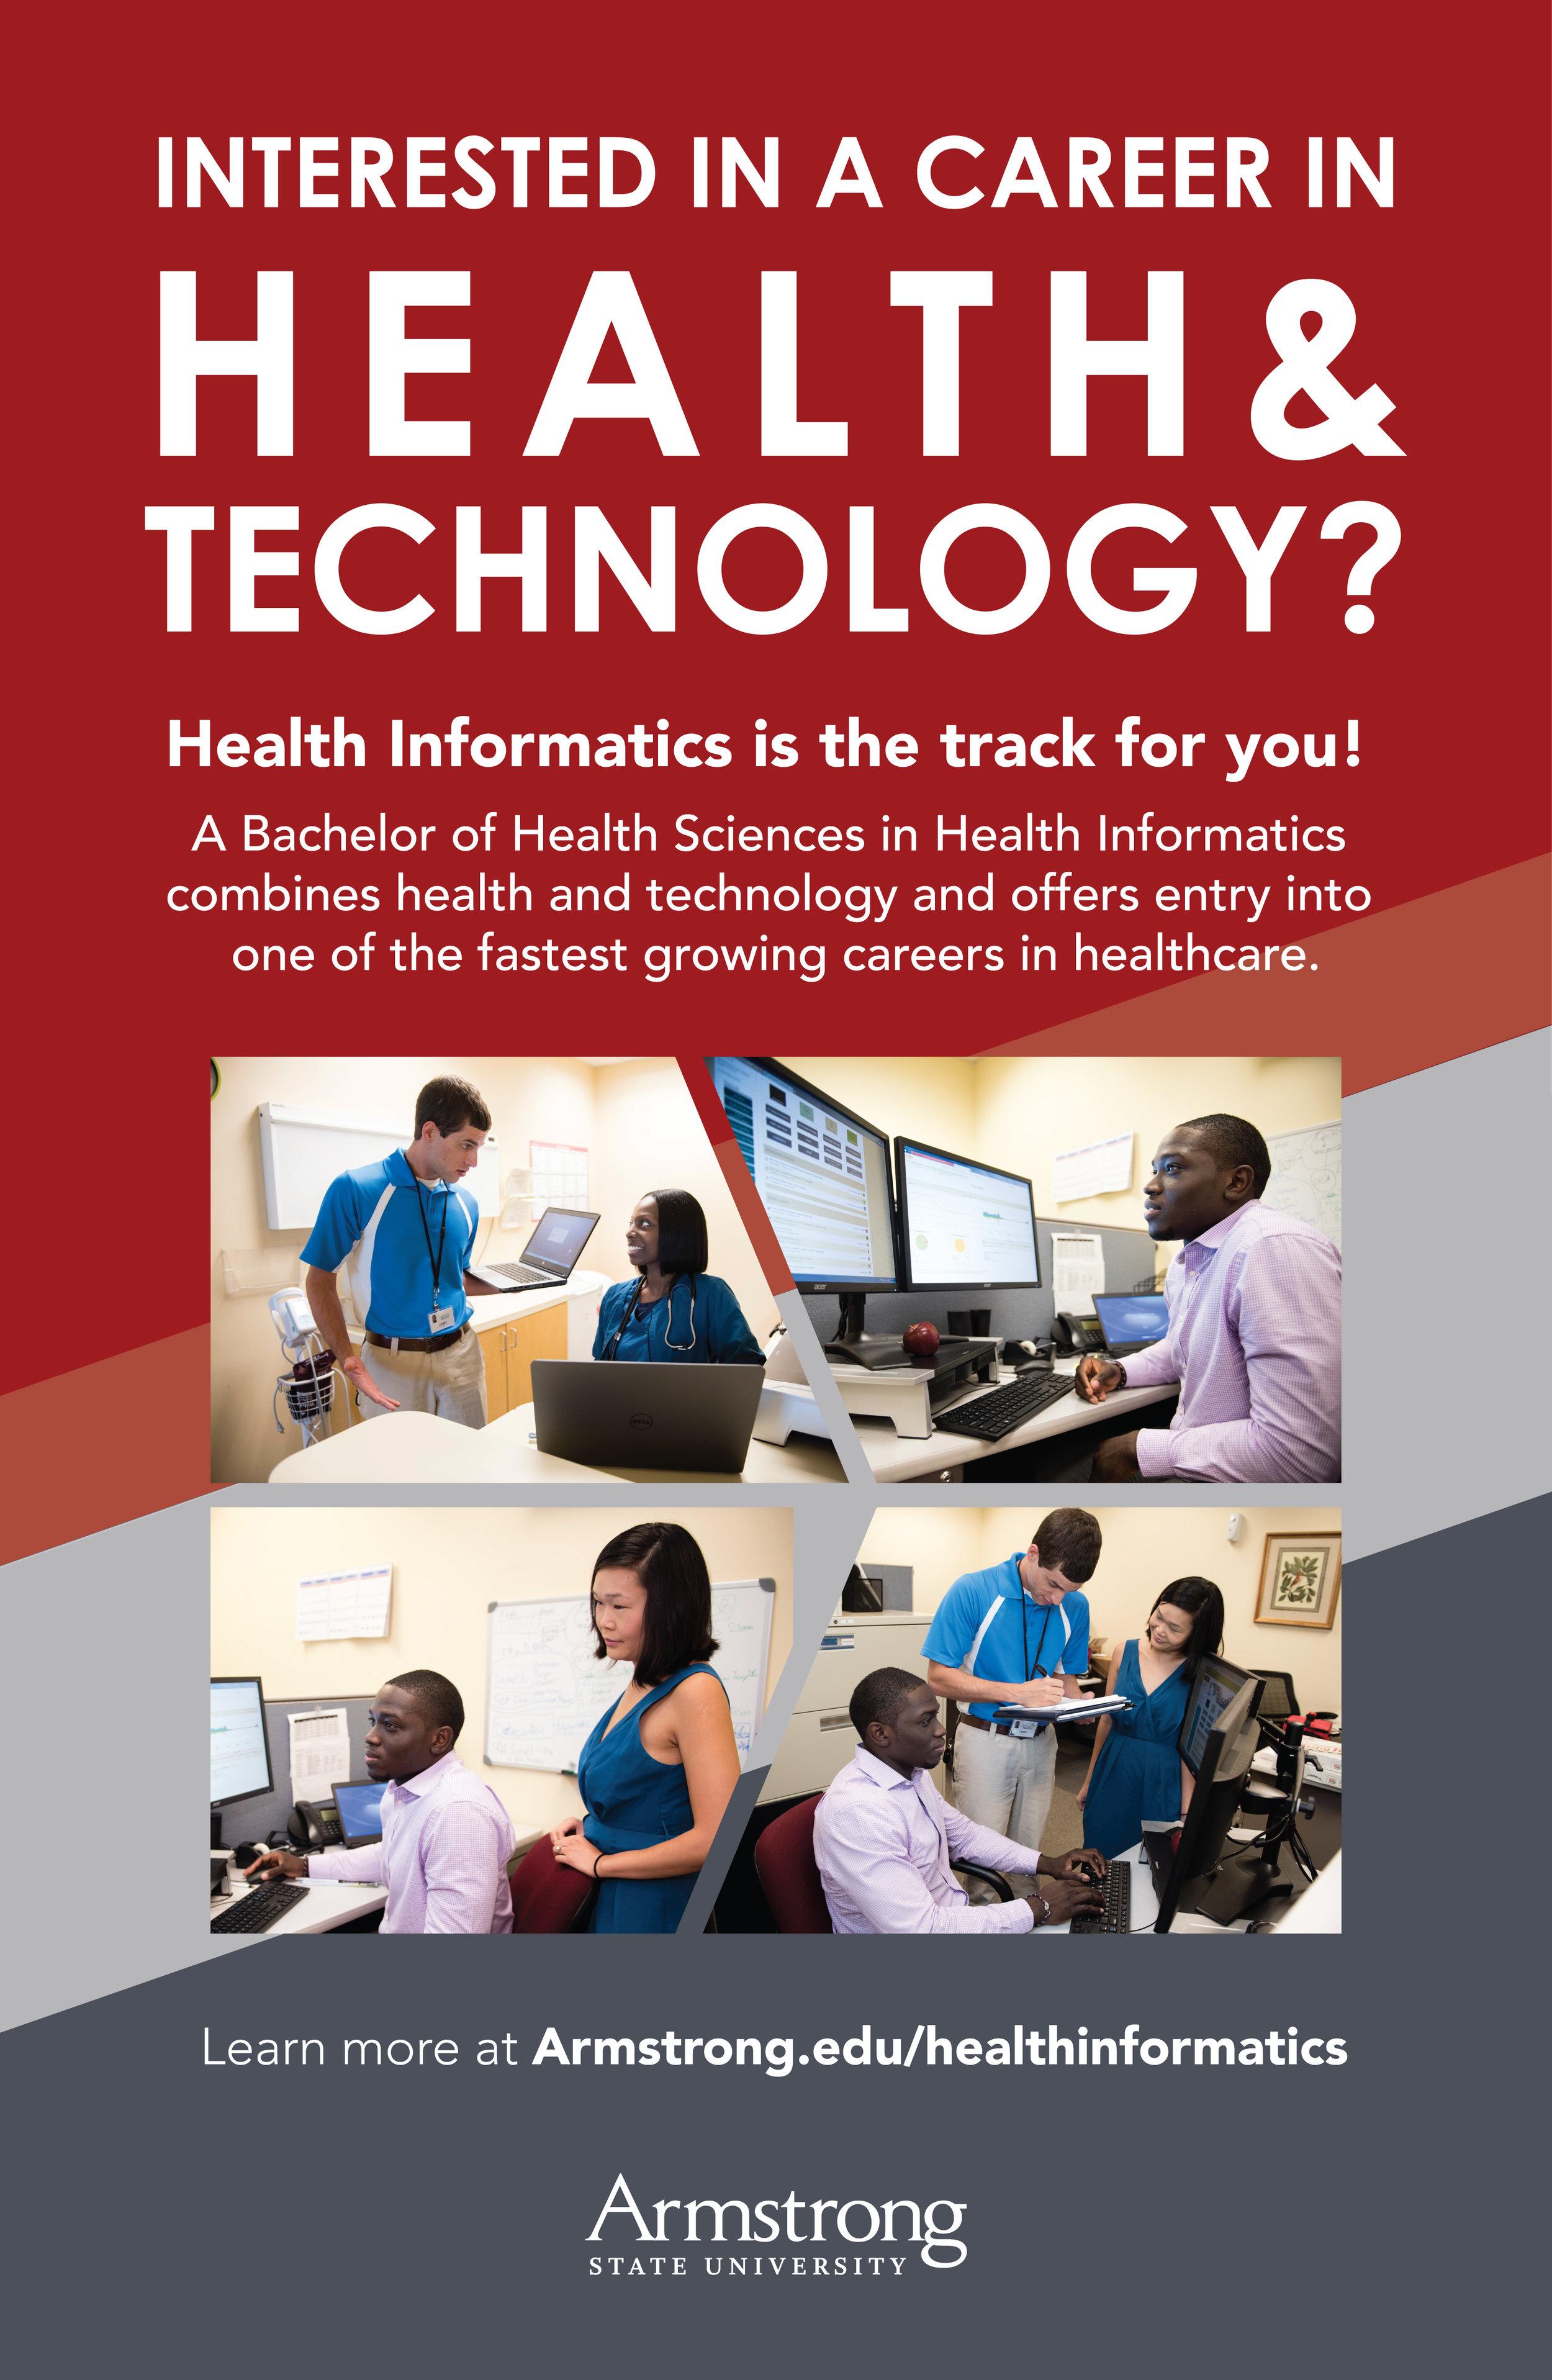 HealthInformatics_2016_Poster-01.jpg